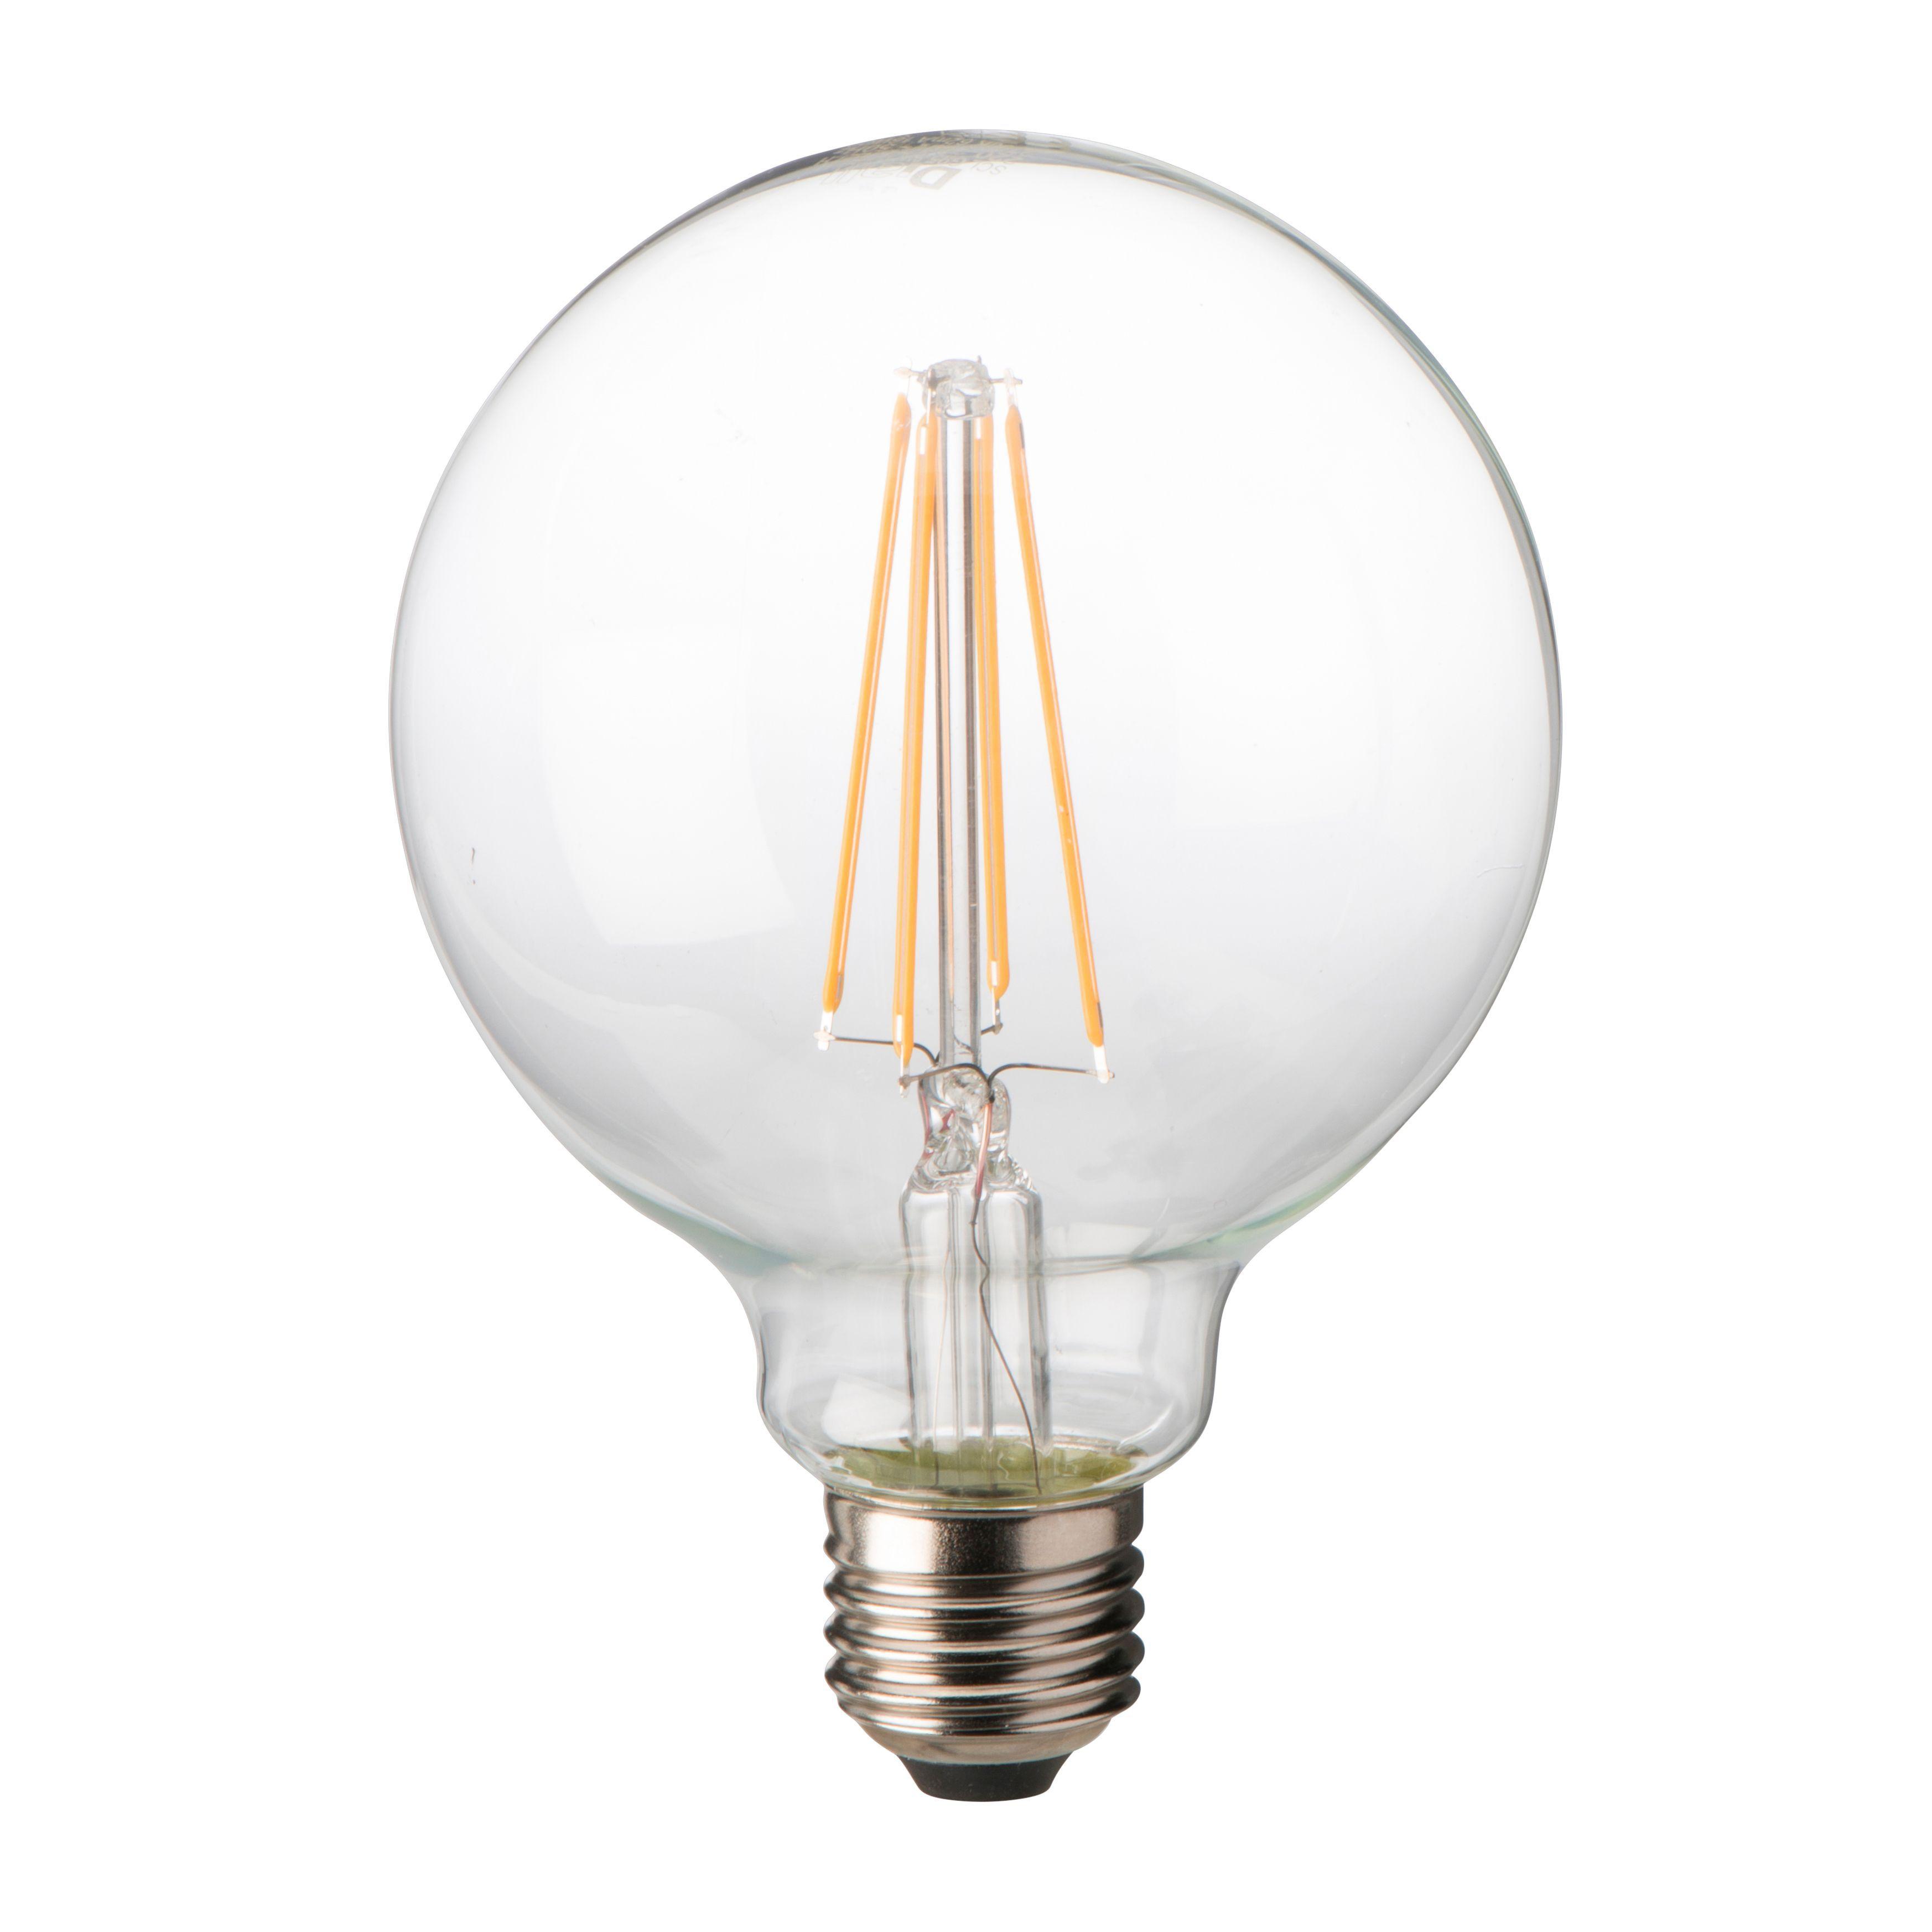 diall e27 8w led filament ball light bulb departments. Black Bedroom Furniture Sets. Home Design Ideas